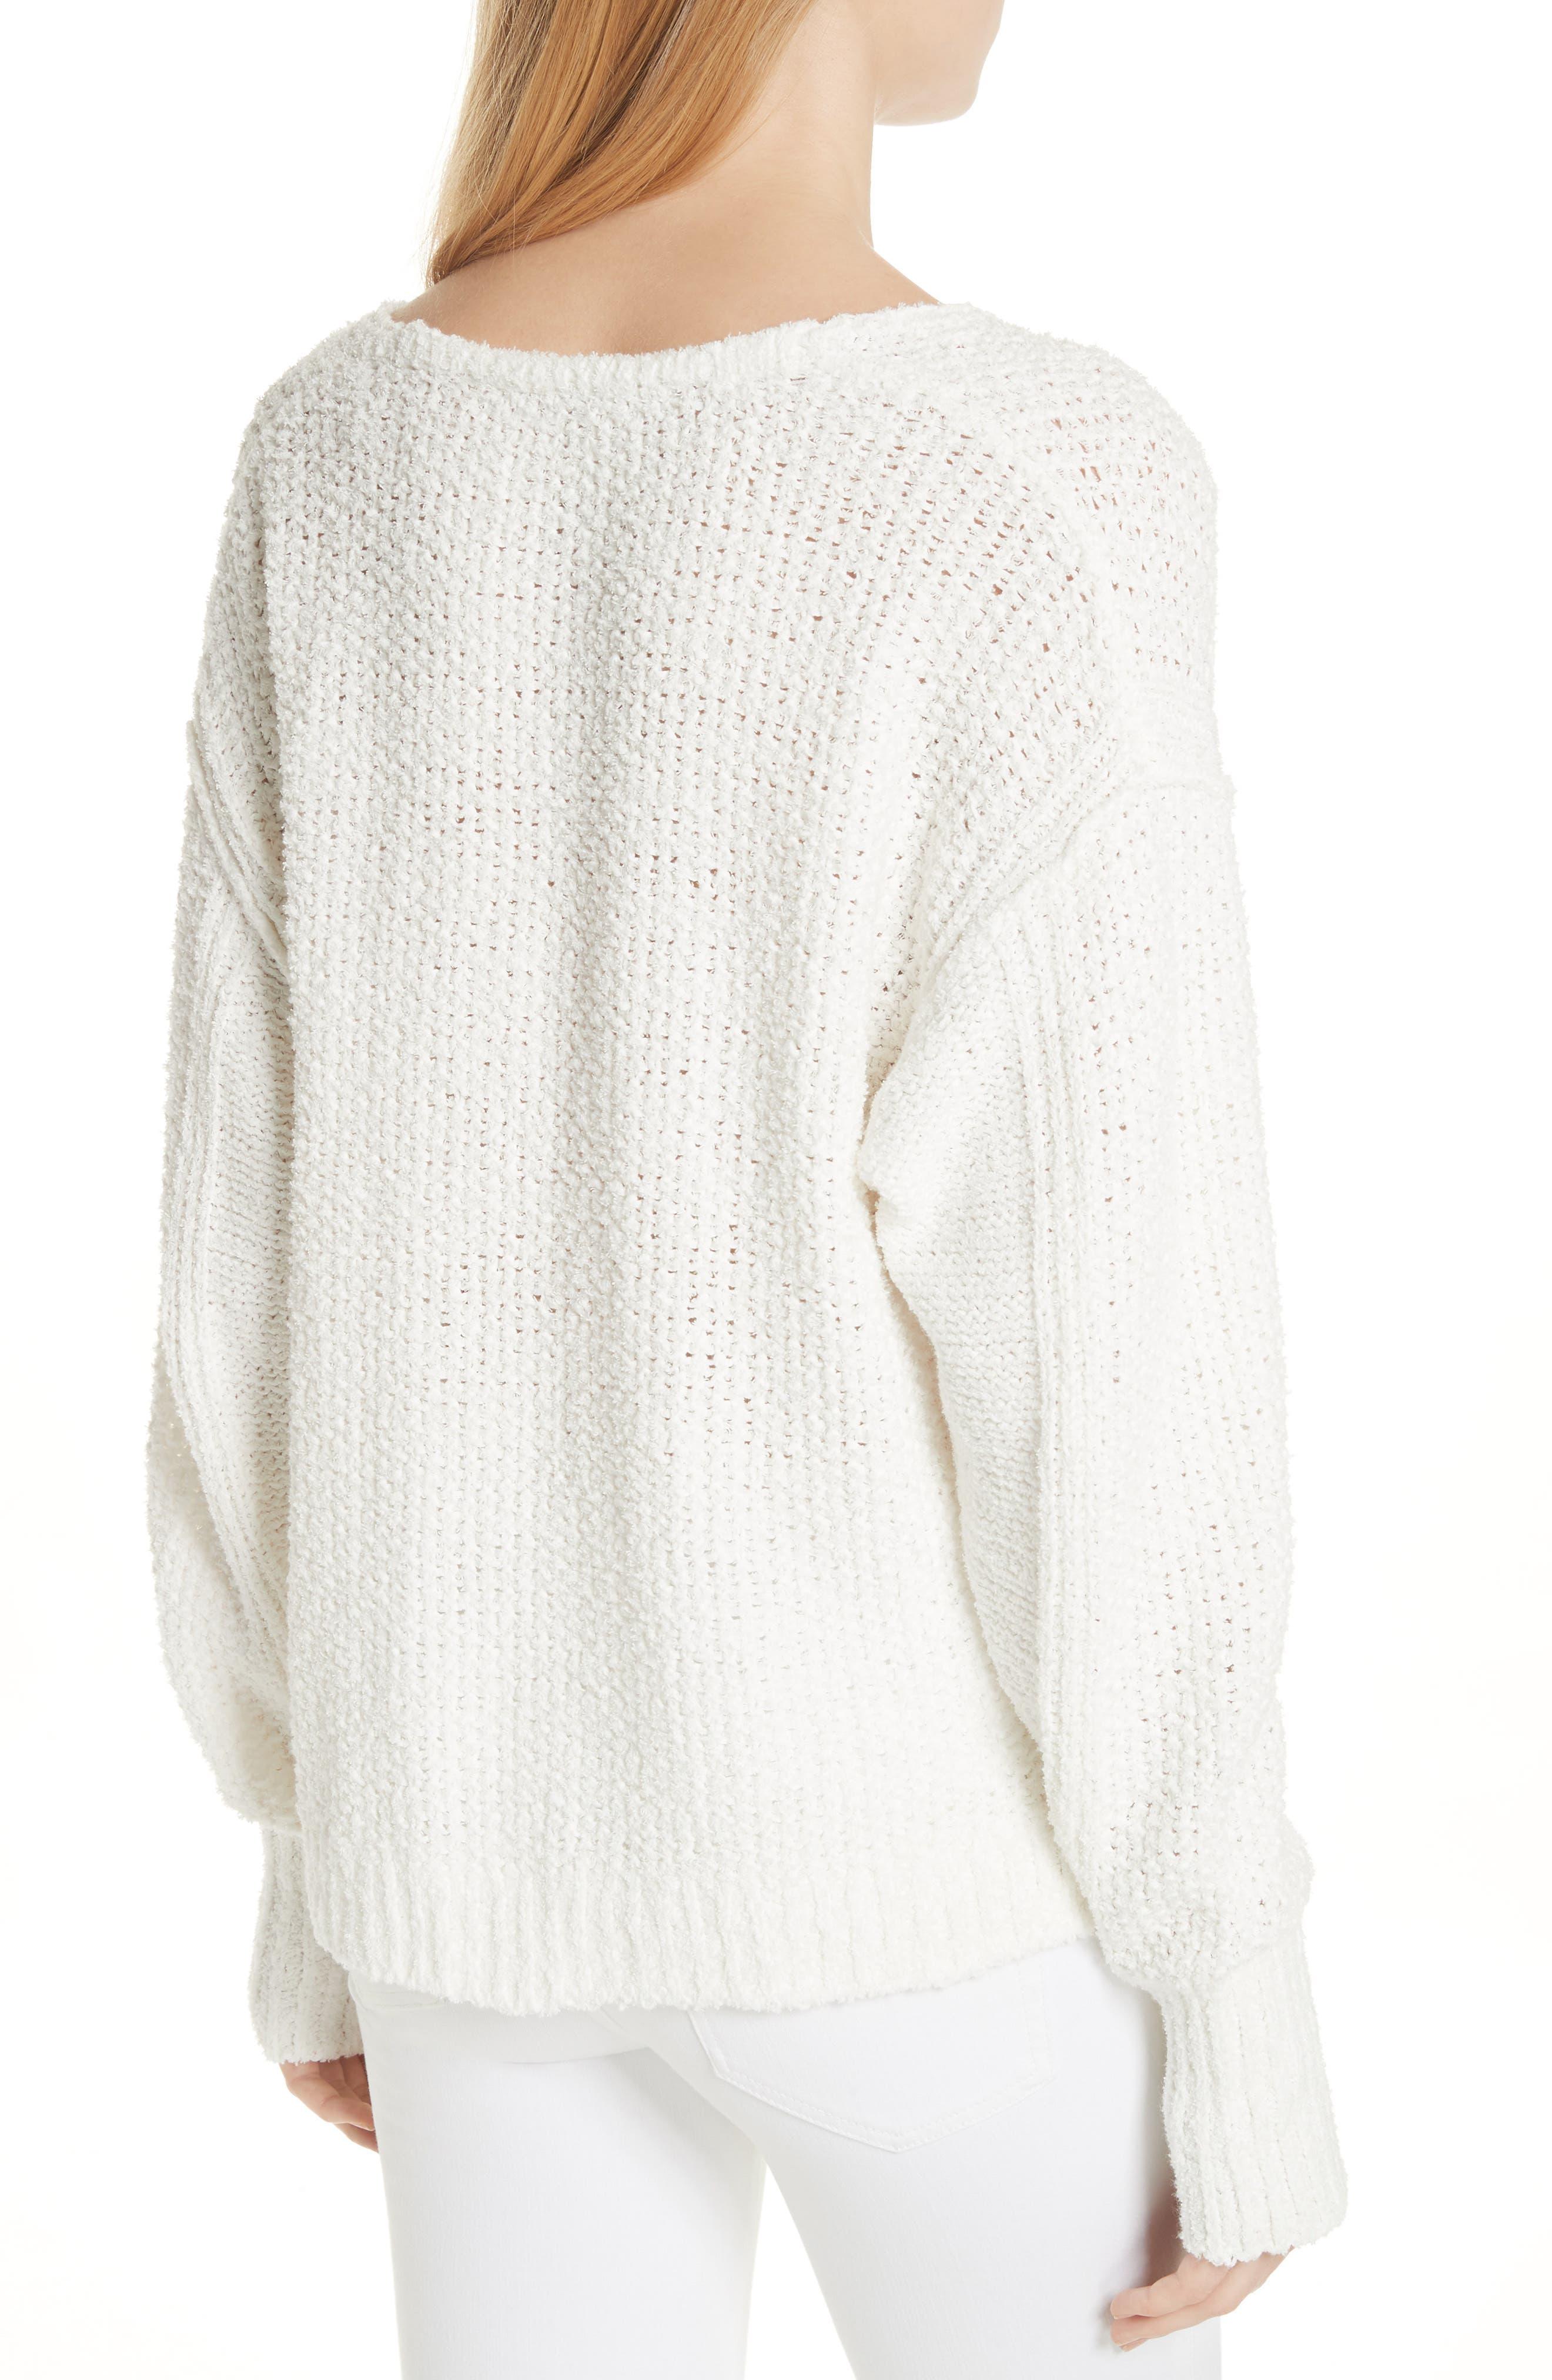 Coco V-Neck Sweater,                             Alternate thumbnail 2, color,                             White